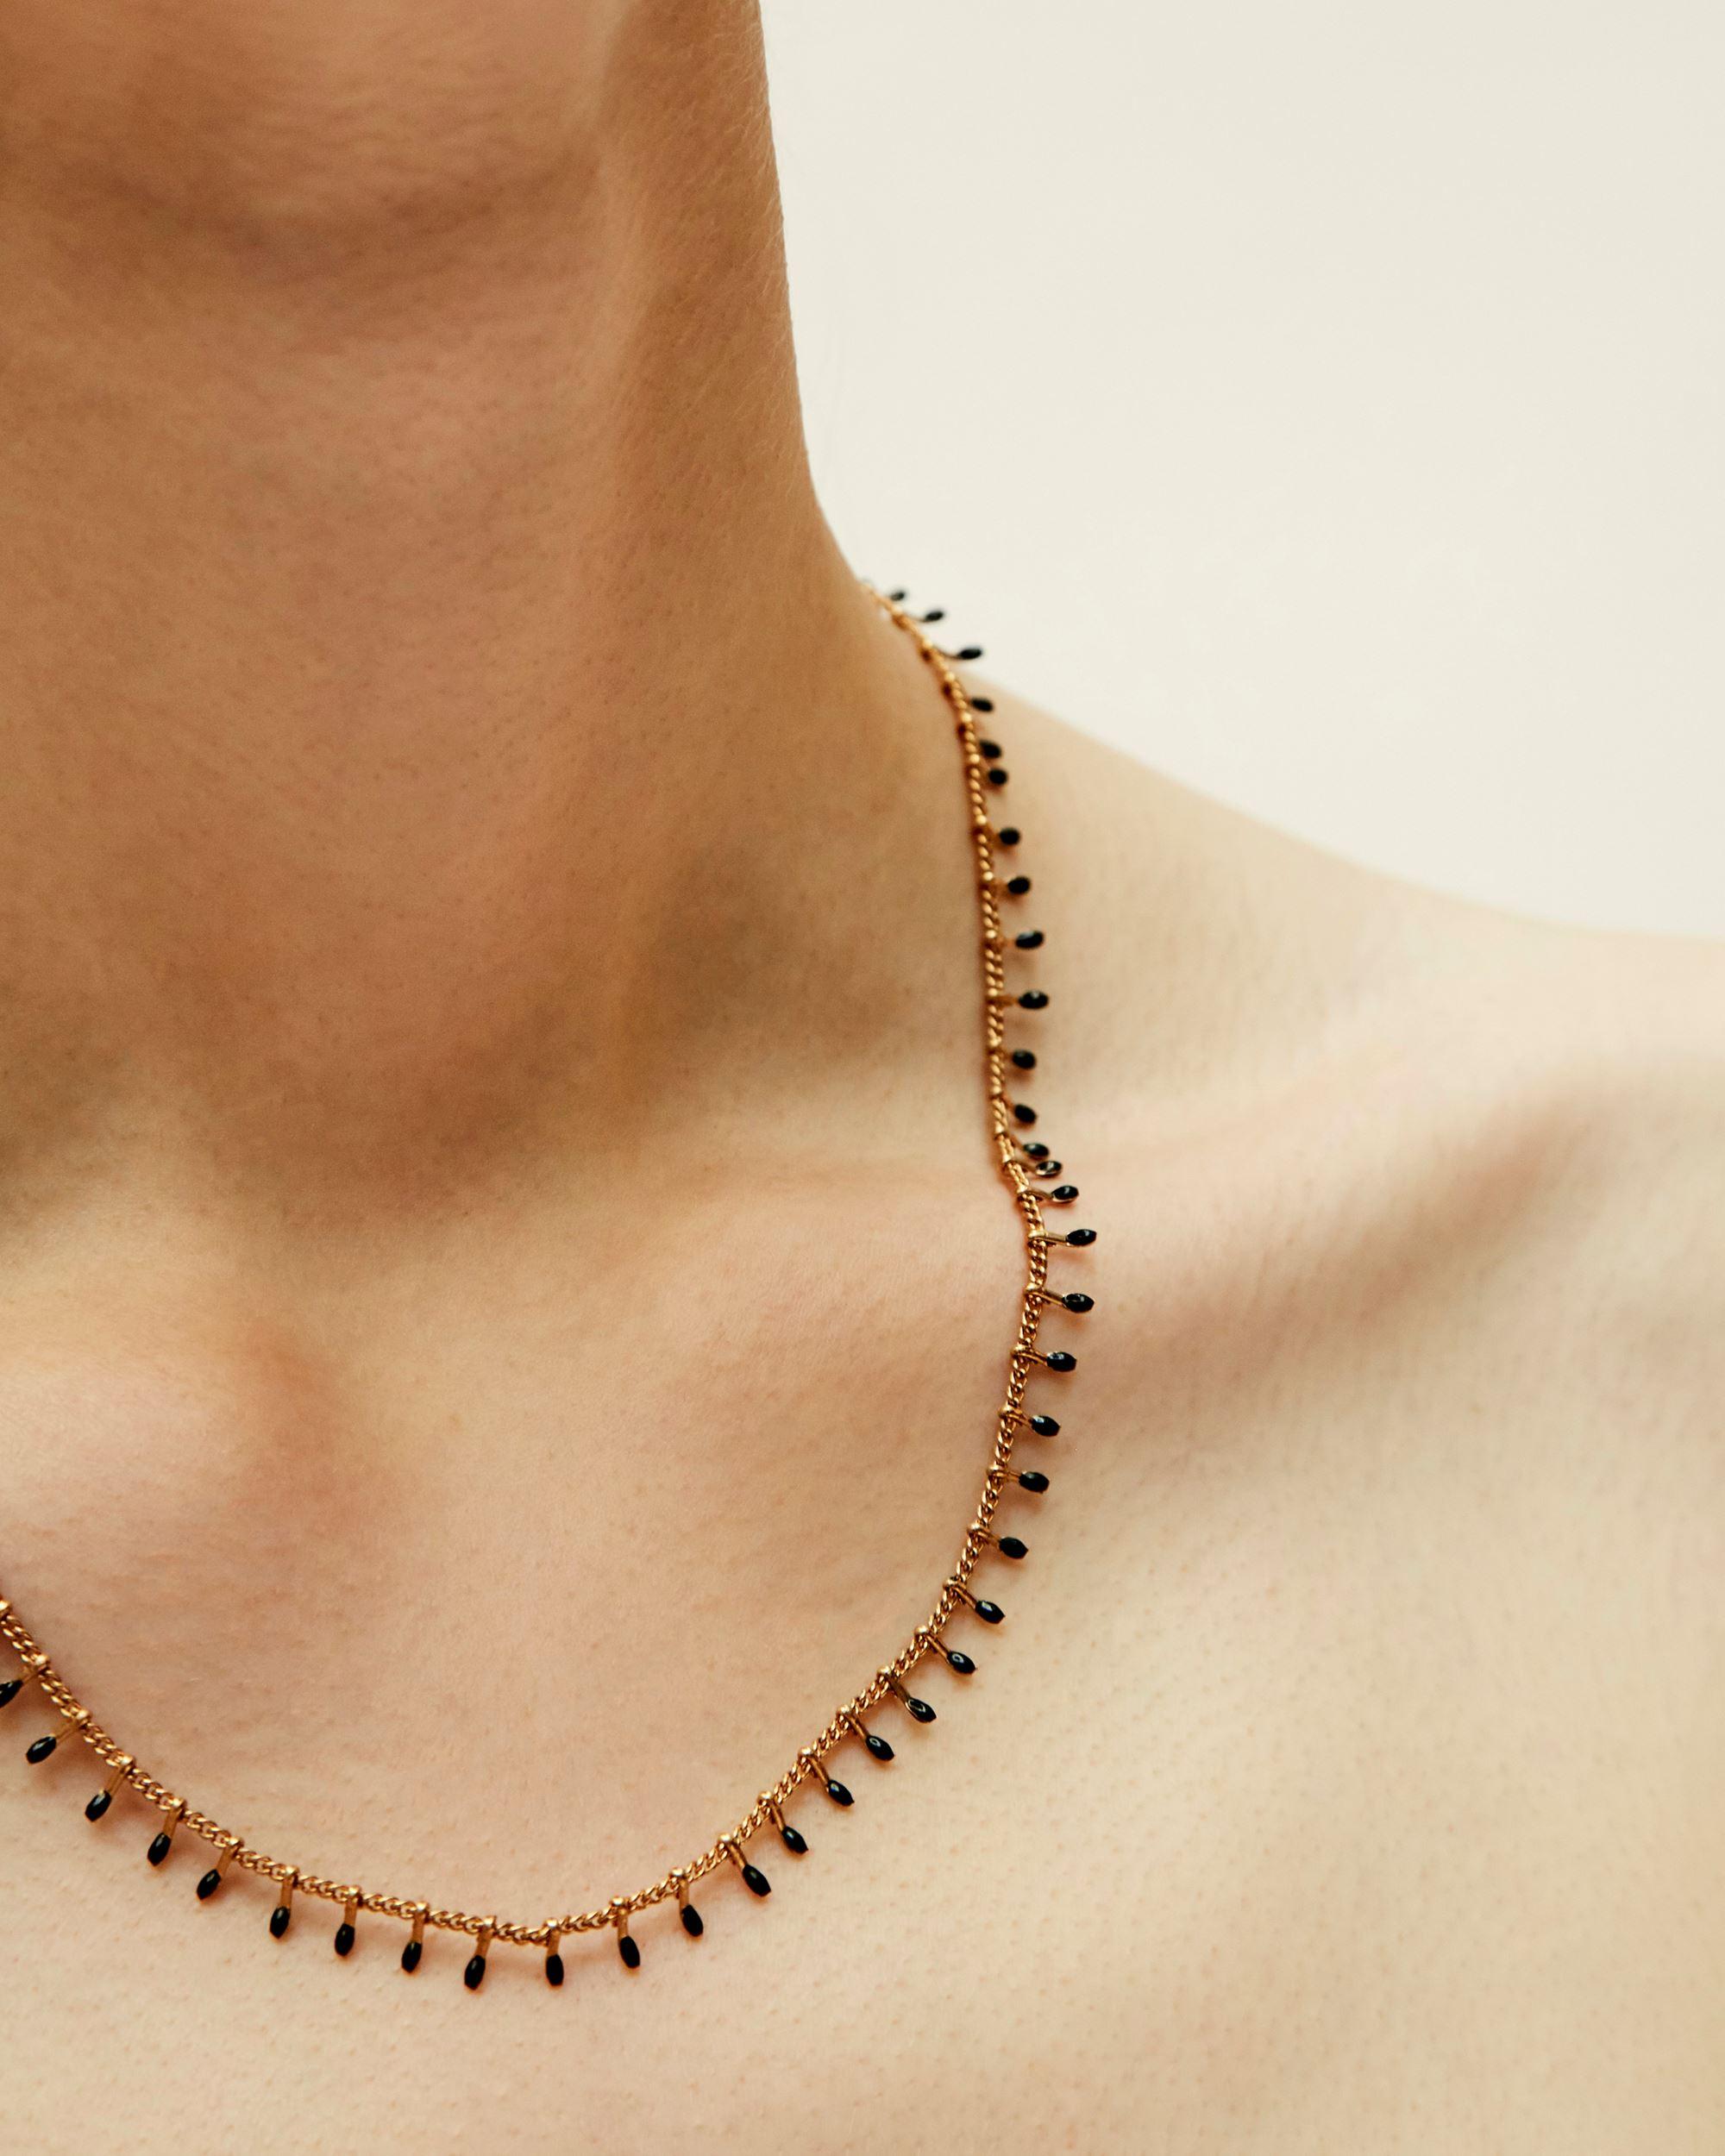 Isabel Marant, Necklace, Casablanca, Fine Jewelry